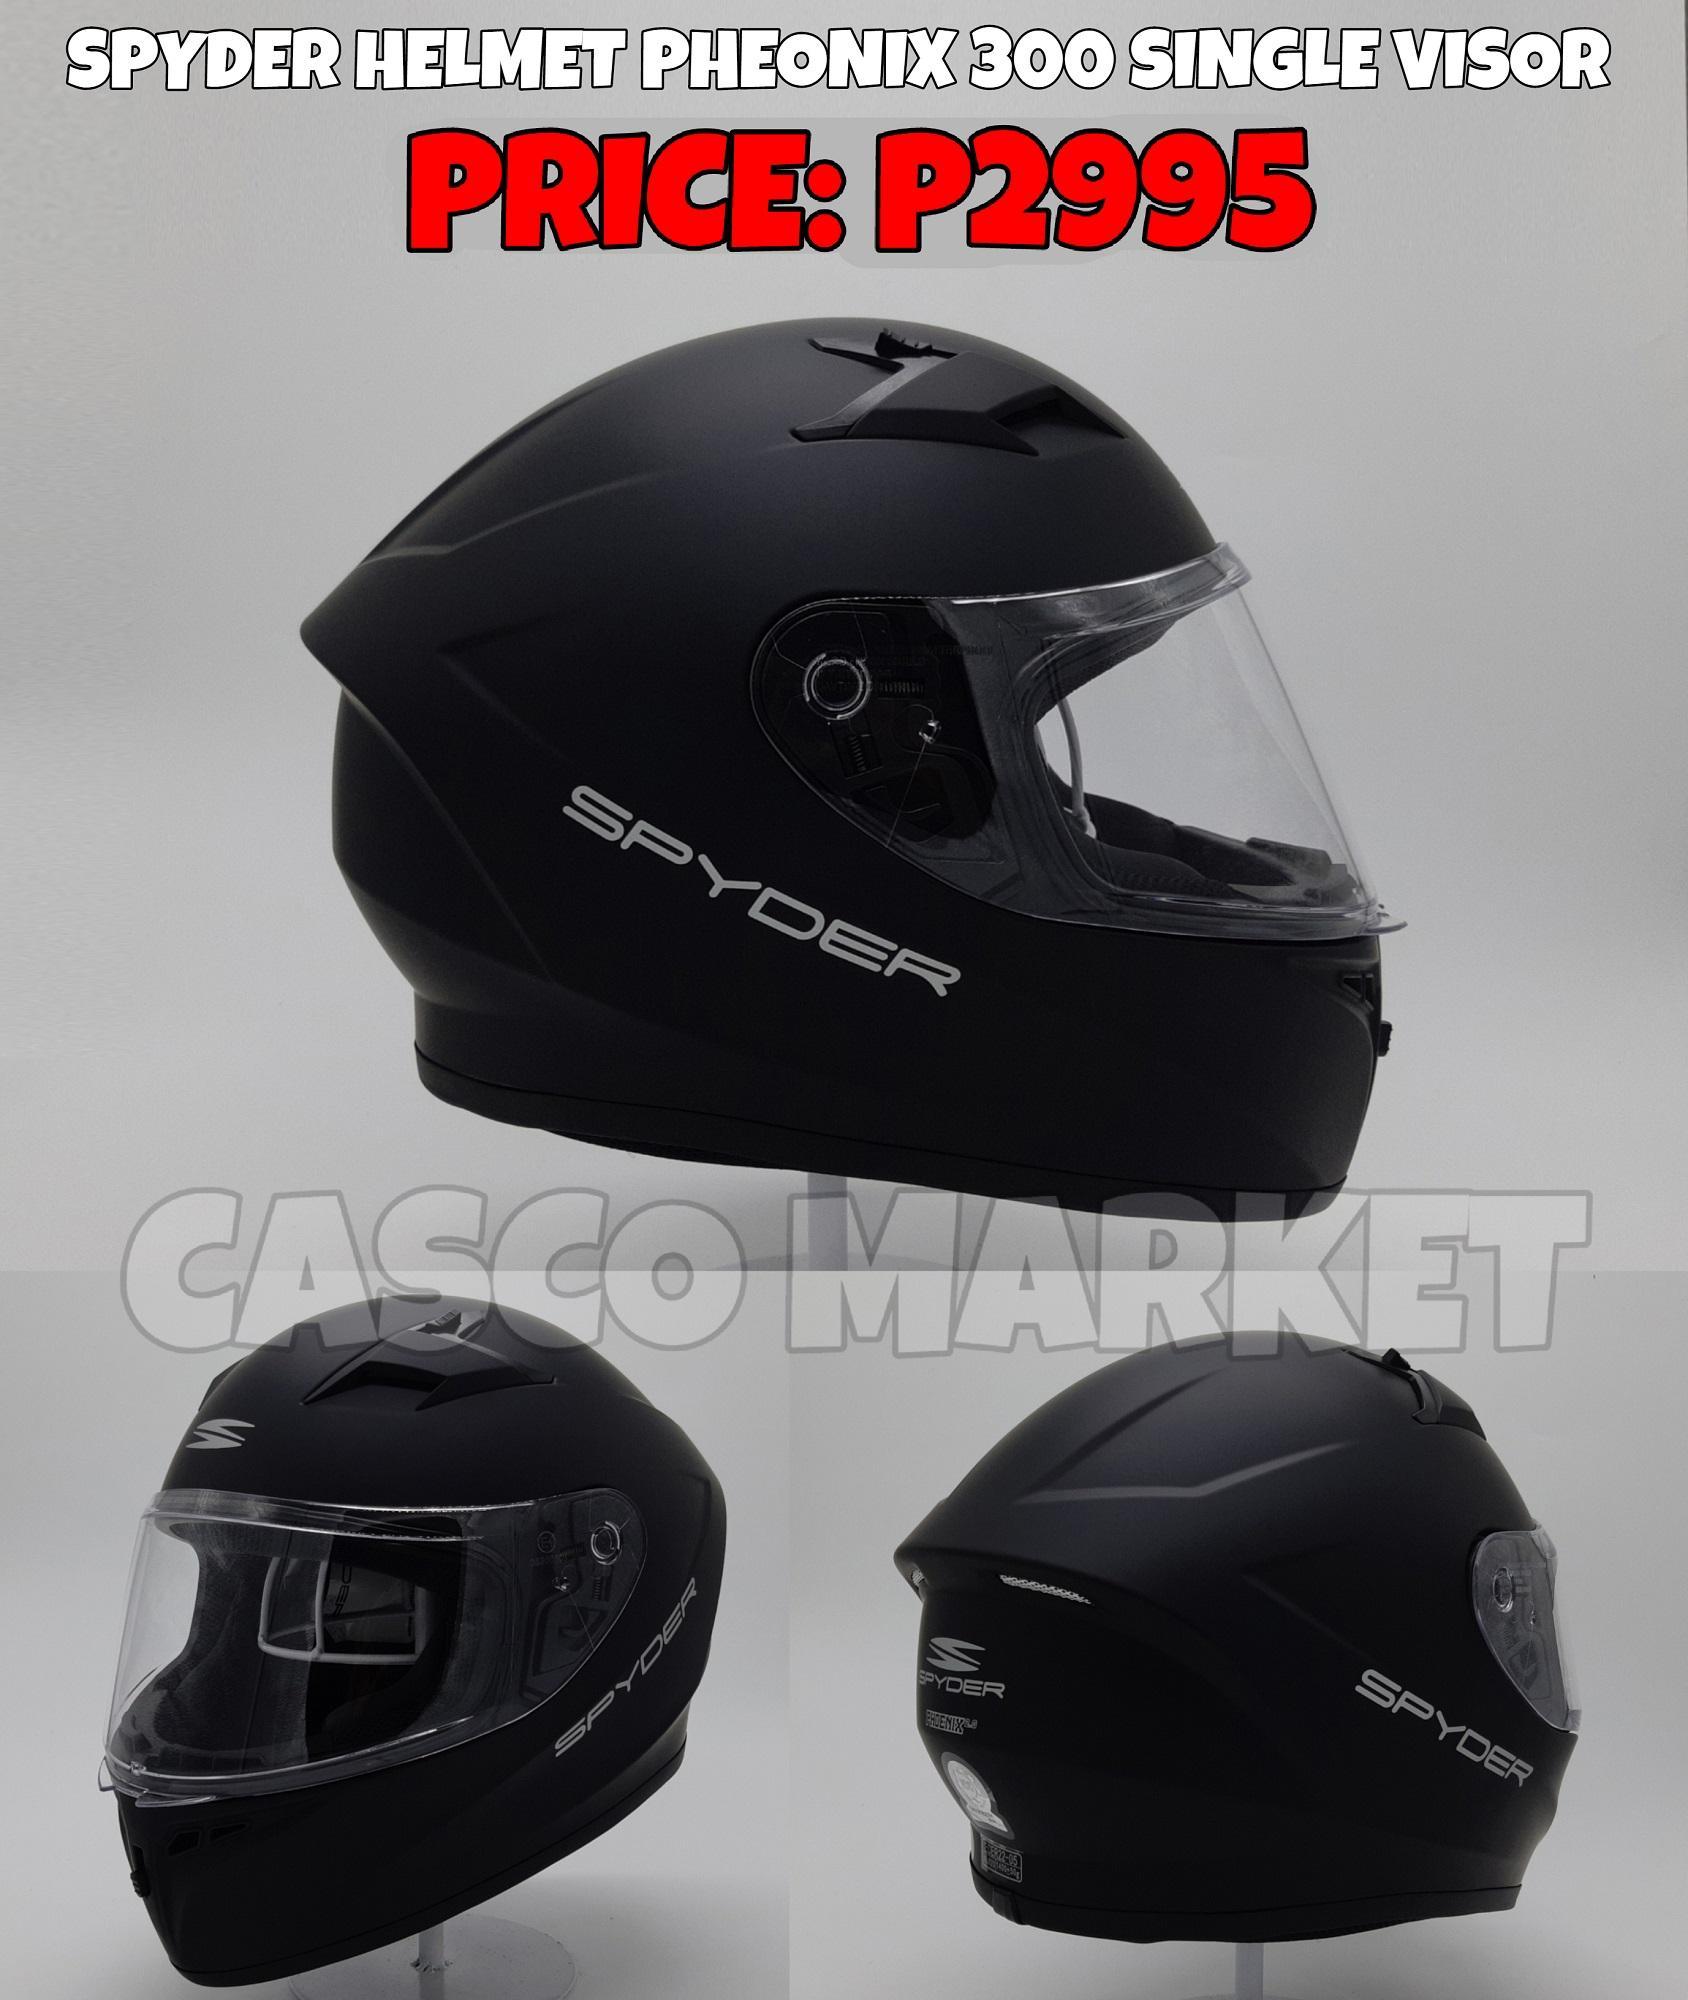 0399e1a3c17 Spyder Philippines: Spyder price list - Spyder Watches, Cycling Wear ...